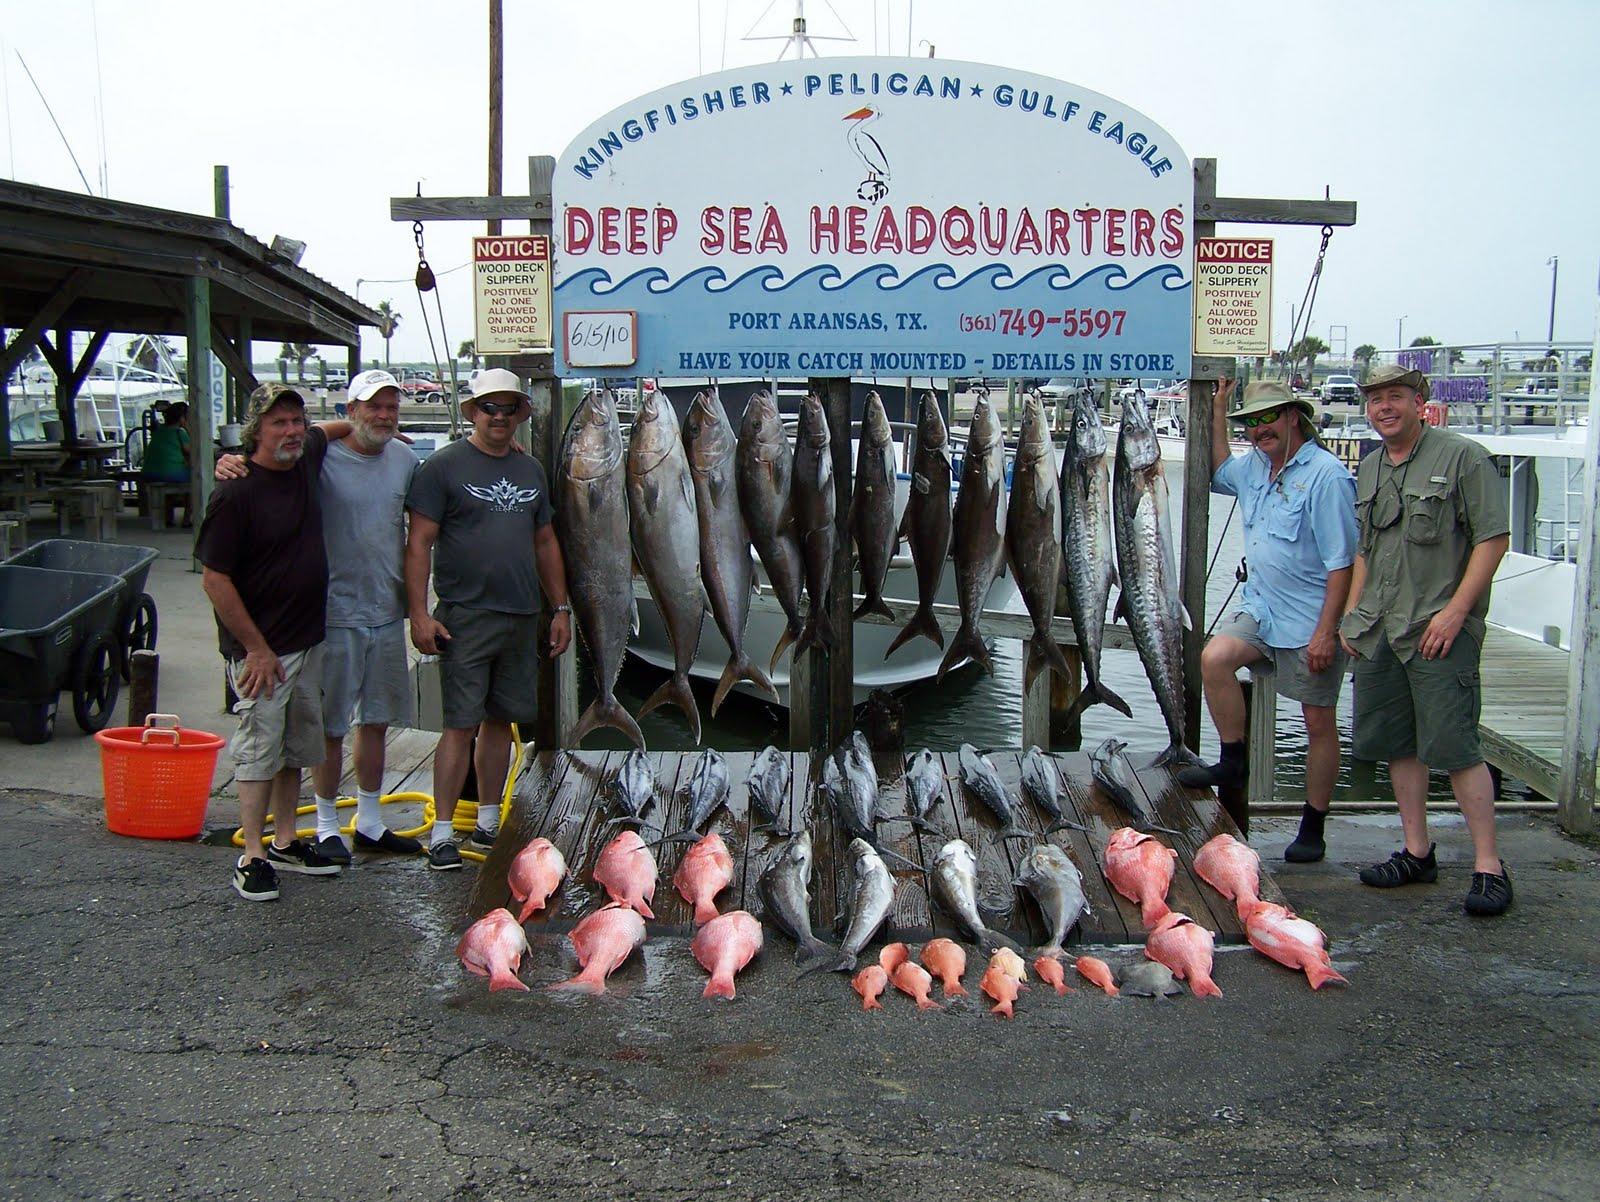 Fishing accurate reels fishing in the gulf for Port aransas deep sea fishing